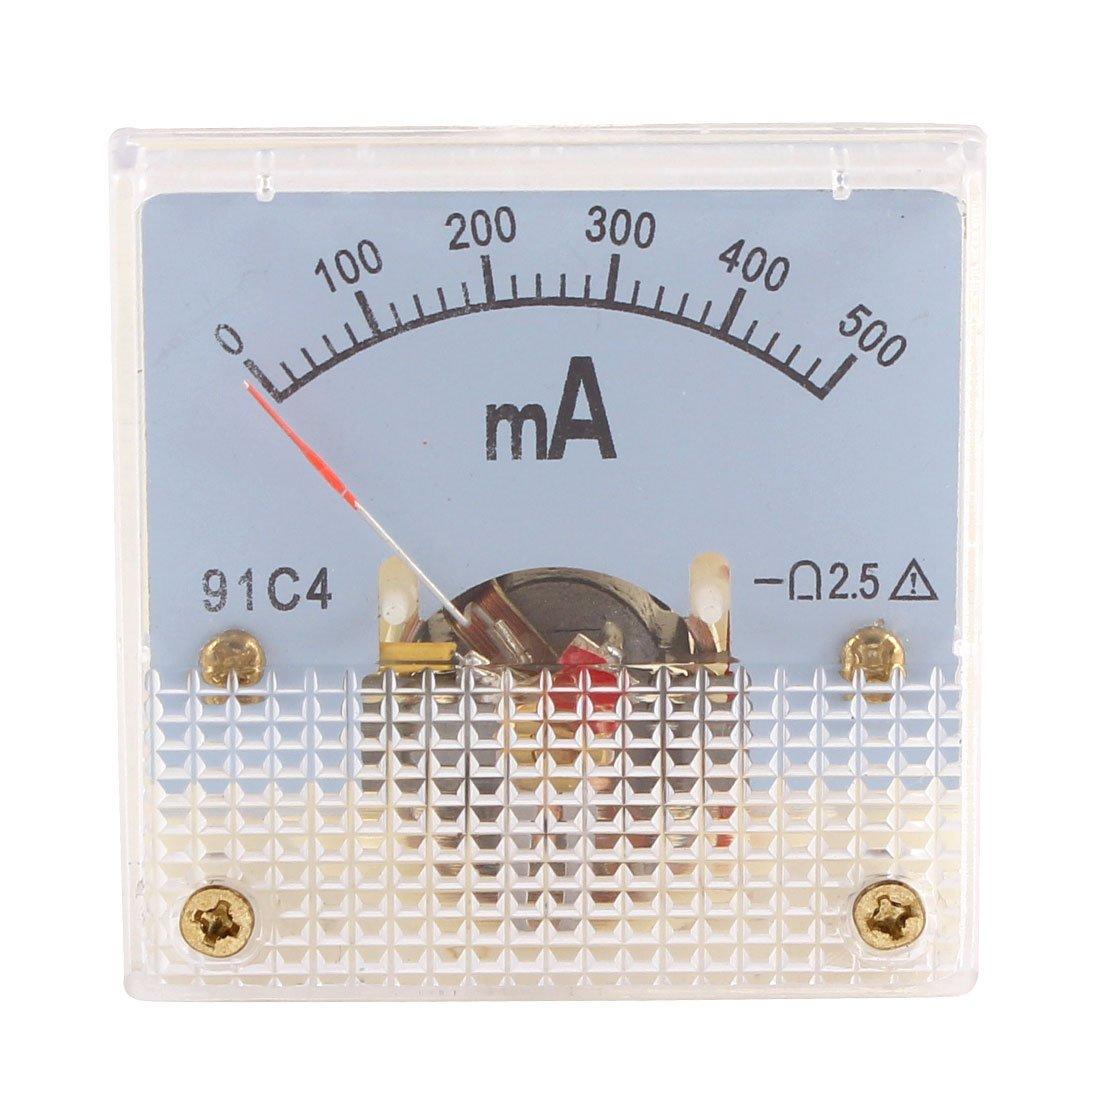 sourcingmap/® 91C4 DC 0-500mA Rect/ángulo Mini Analogico Panel Amper/ímetro Medidor Amper/ímetro Clase 2.5